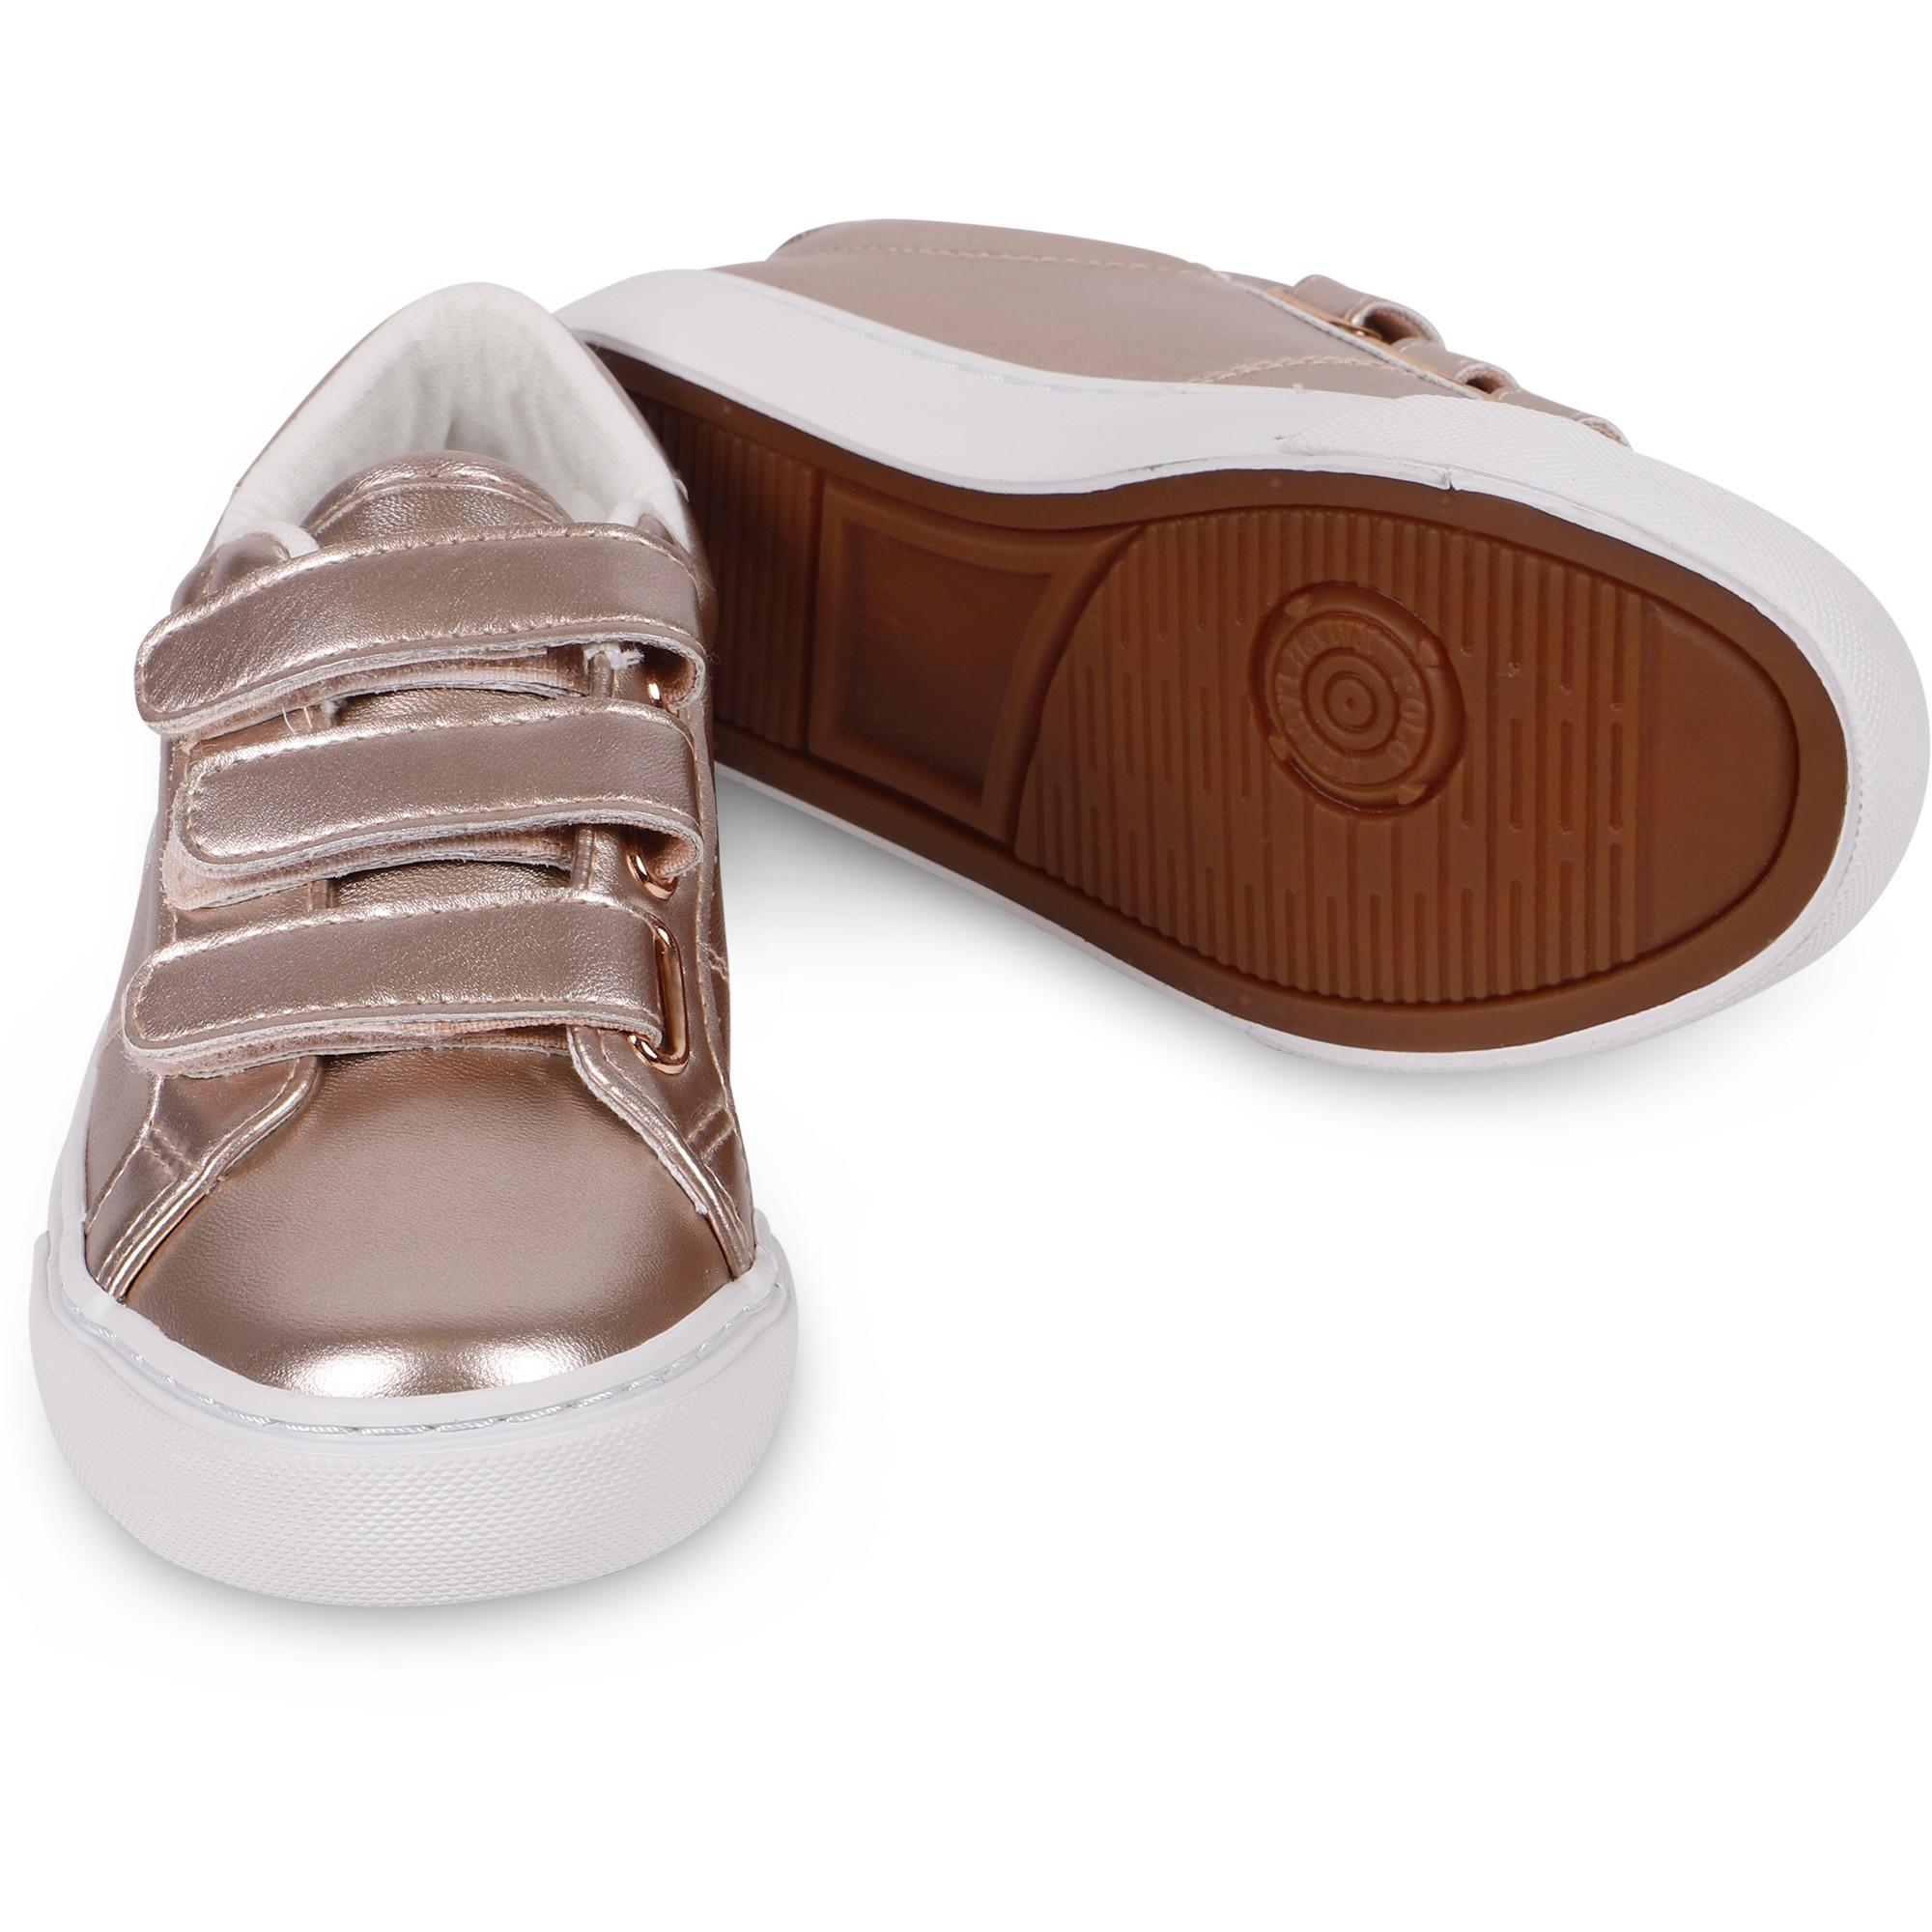 girls rose gold sneakers